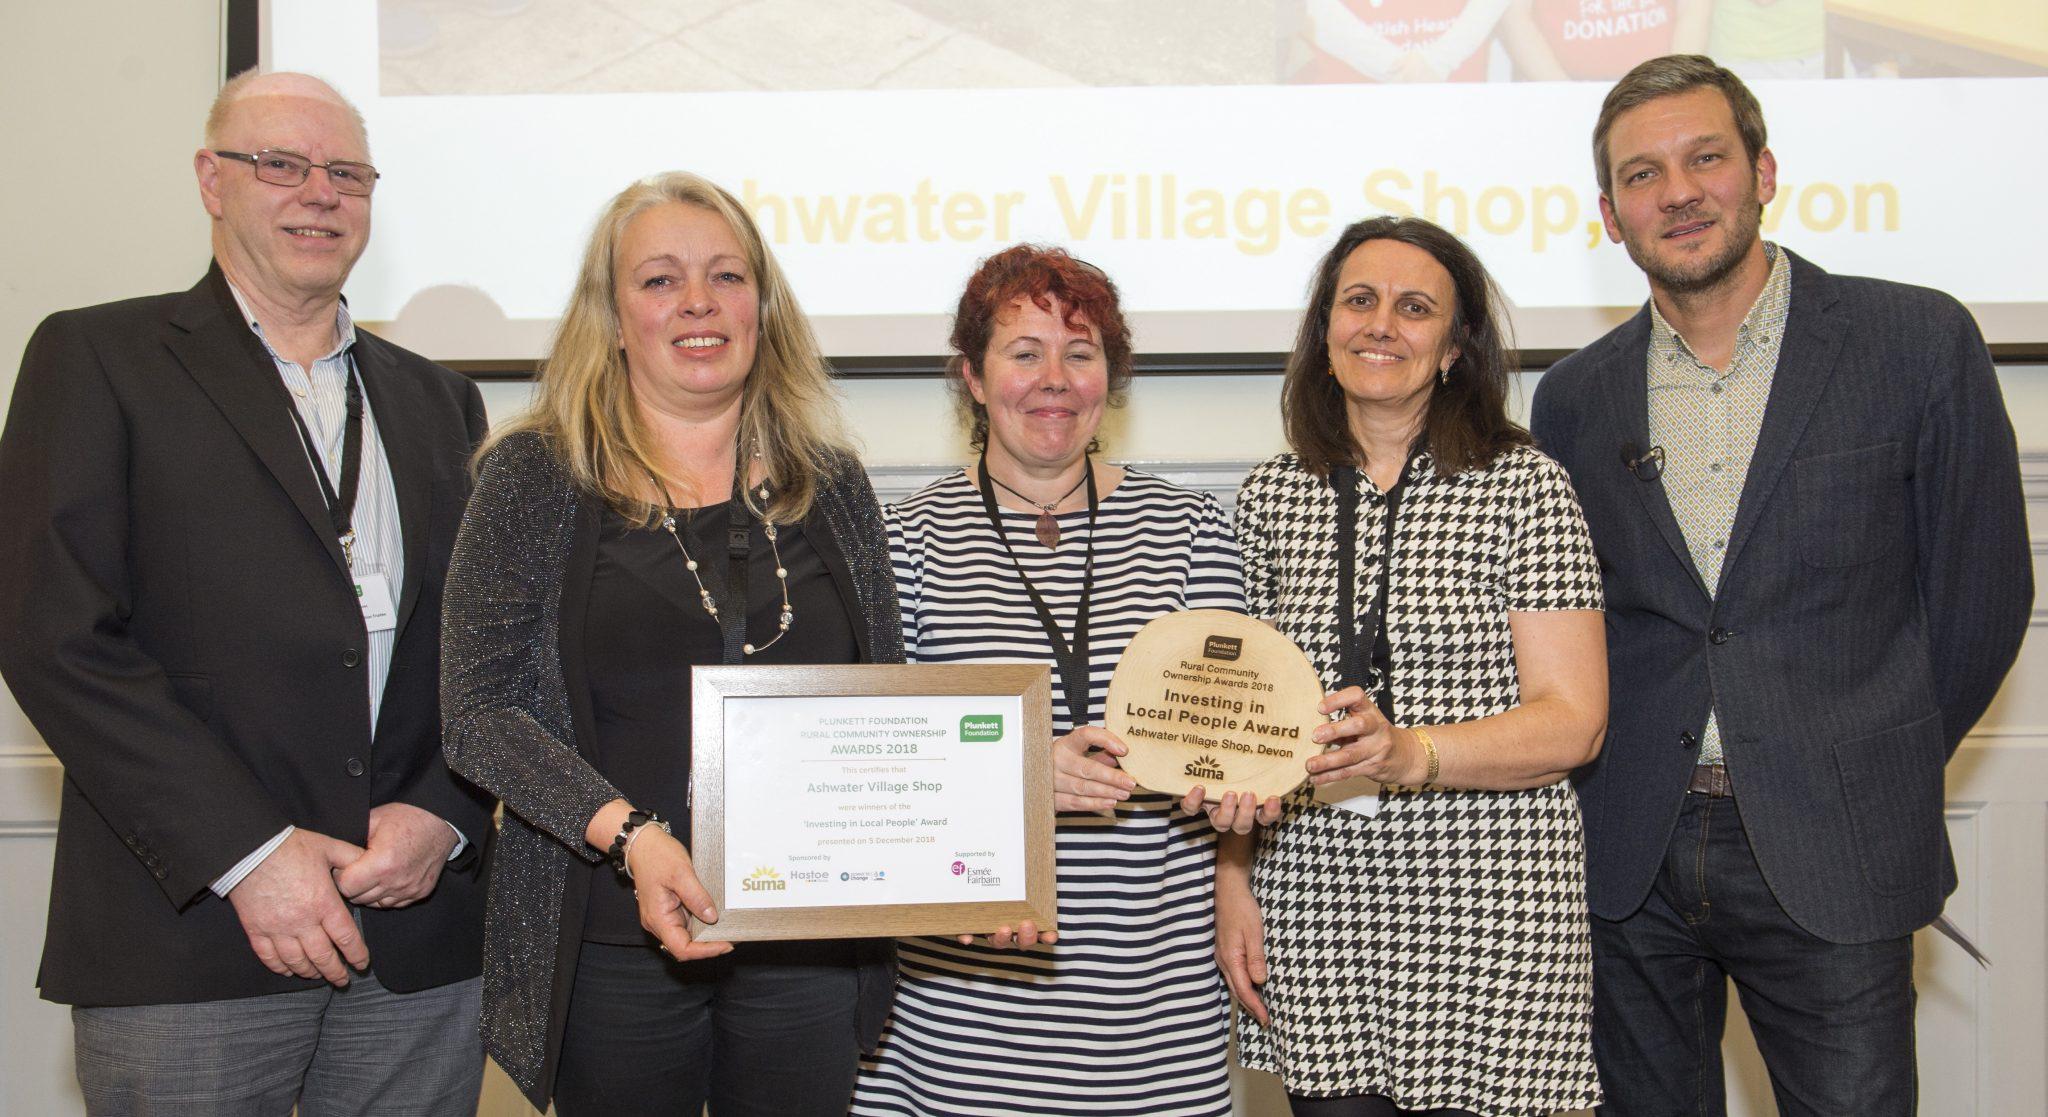 Ashwater Village Shop picks up its award